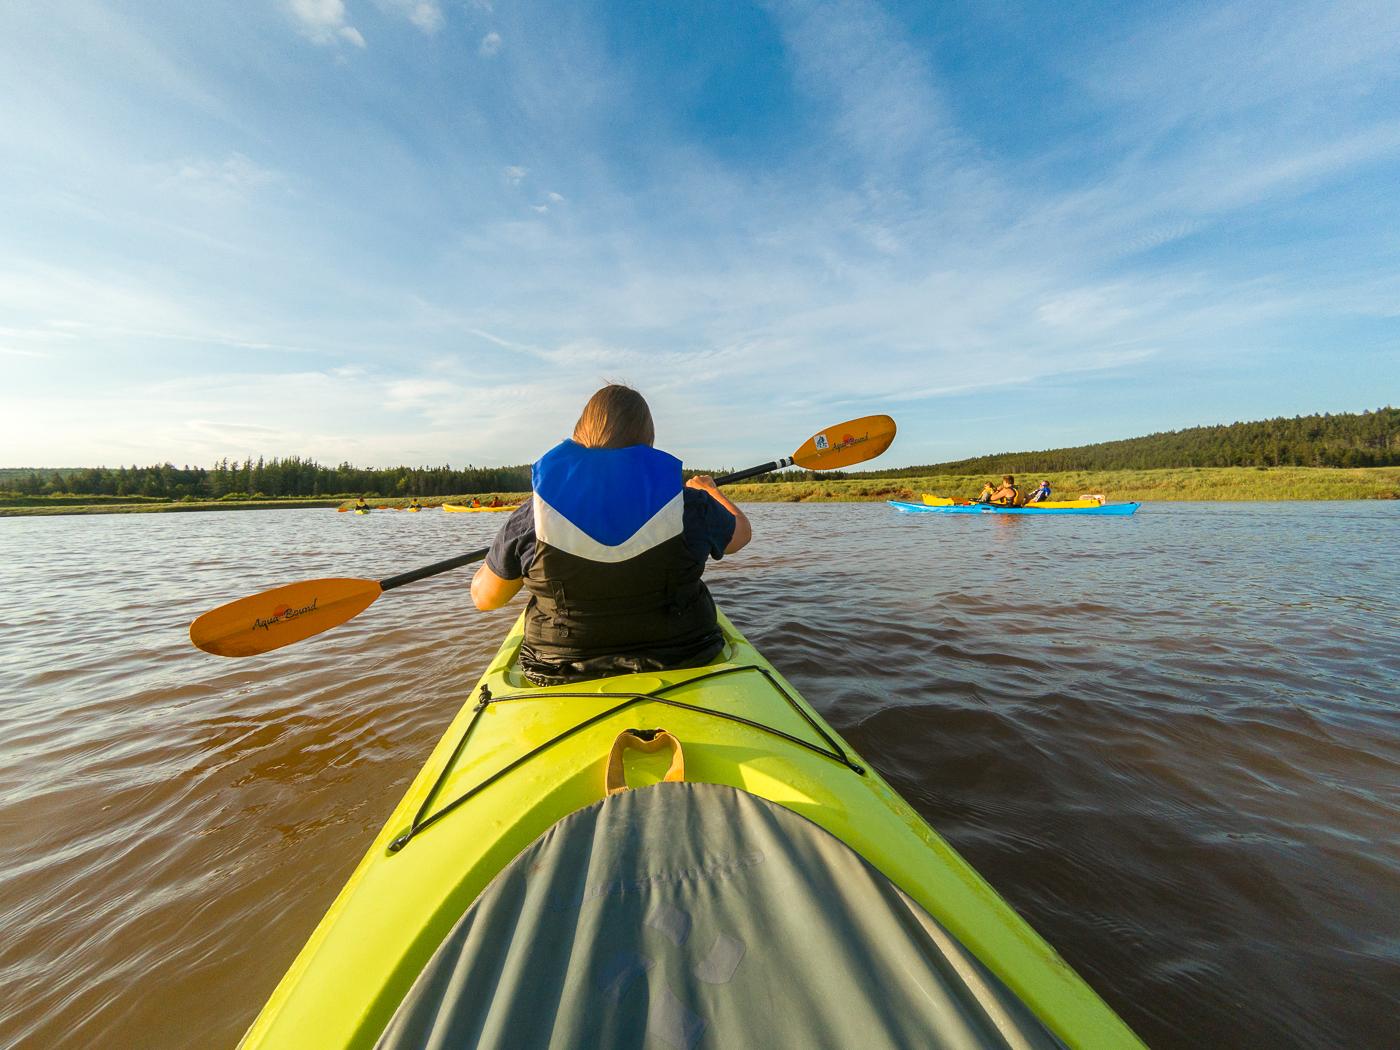 Maude en kayak dans marais - Nouveau-Brunswick